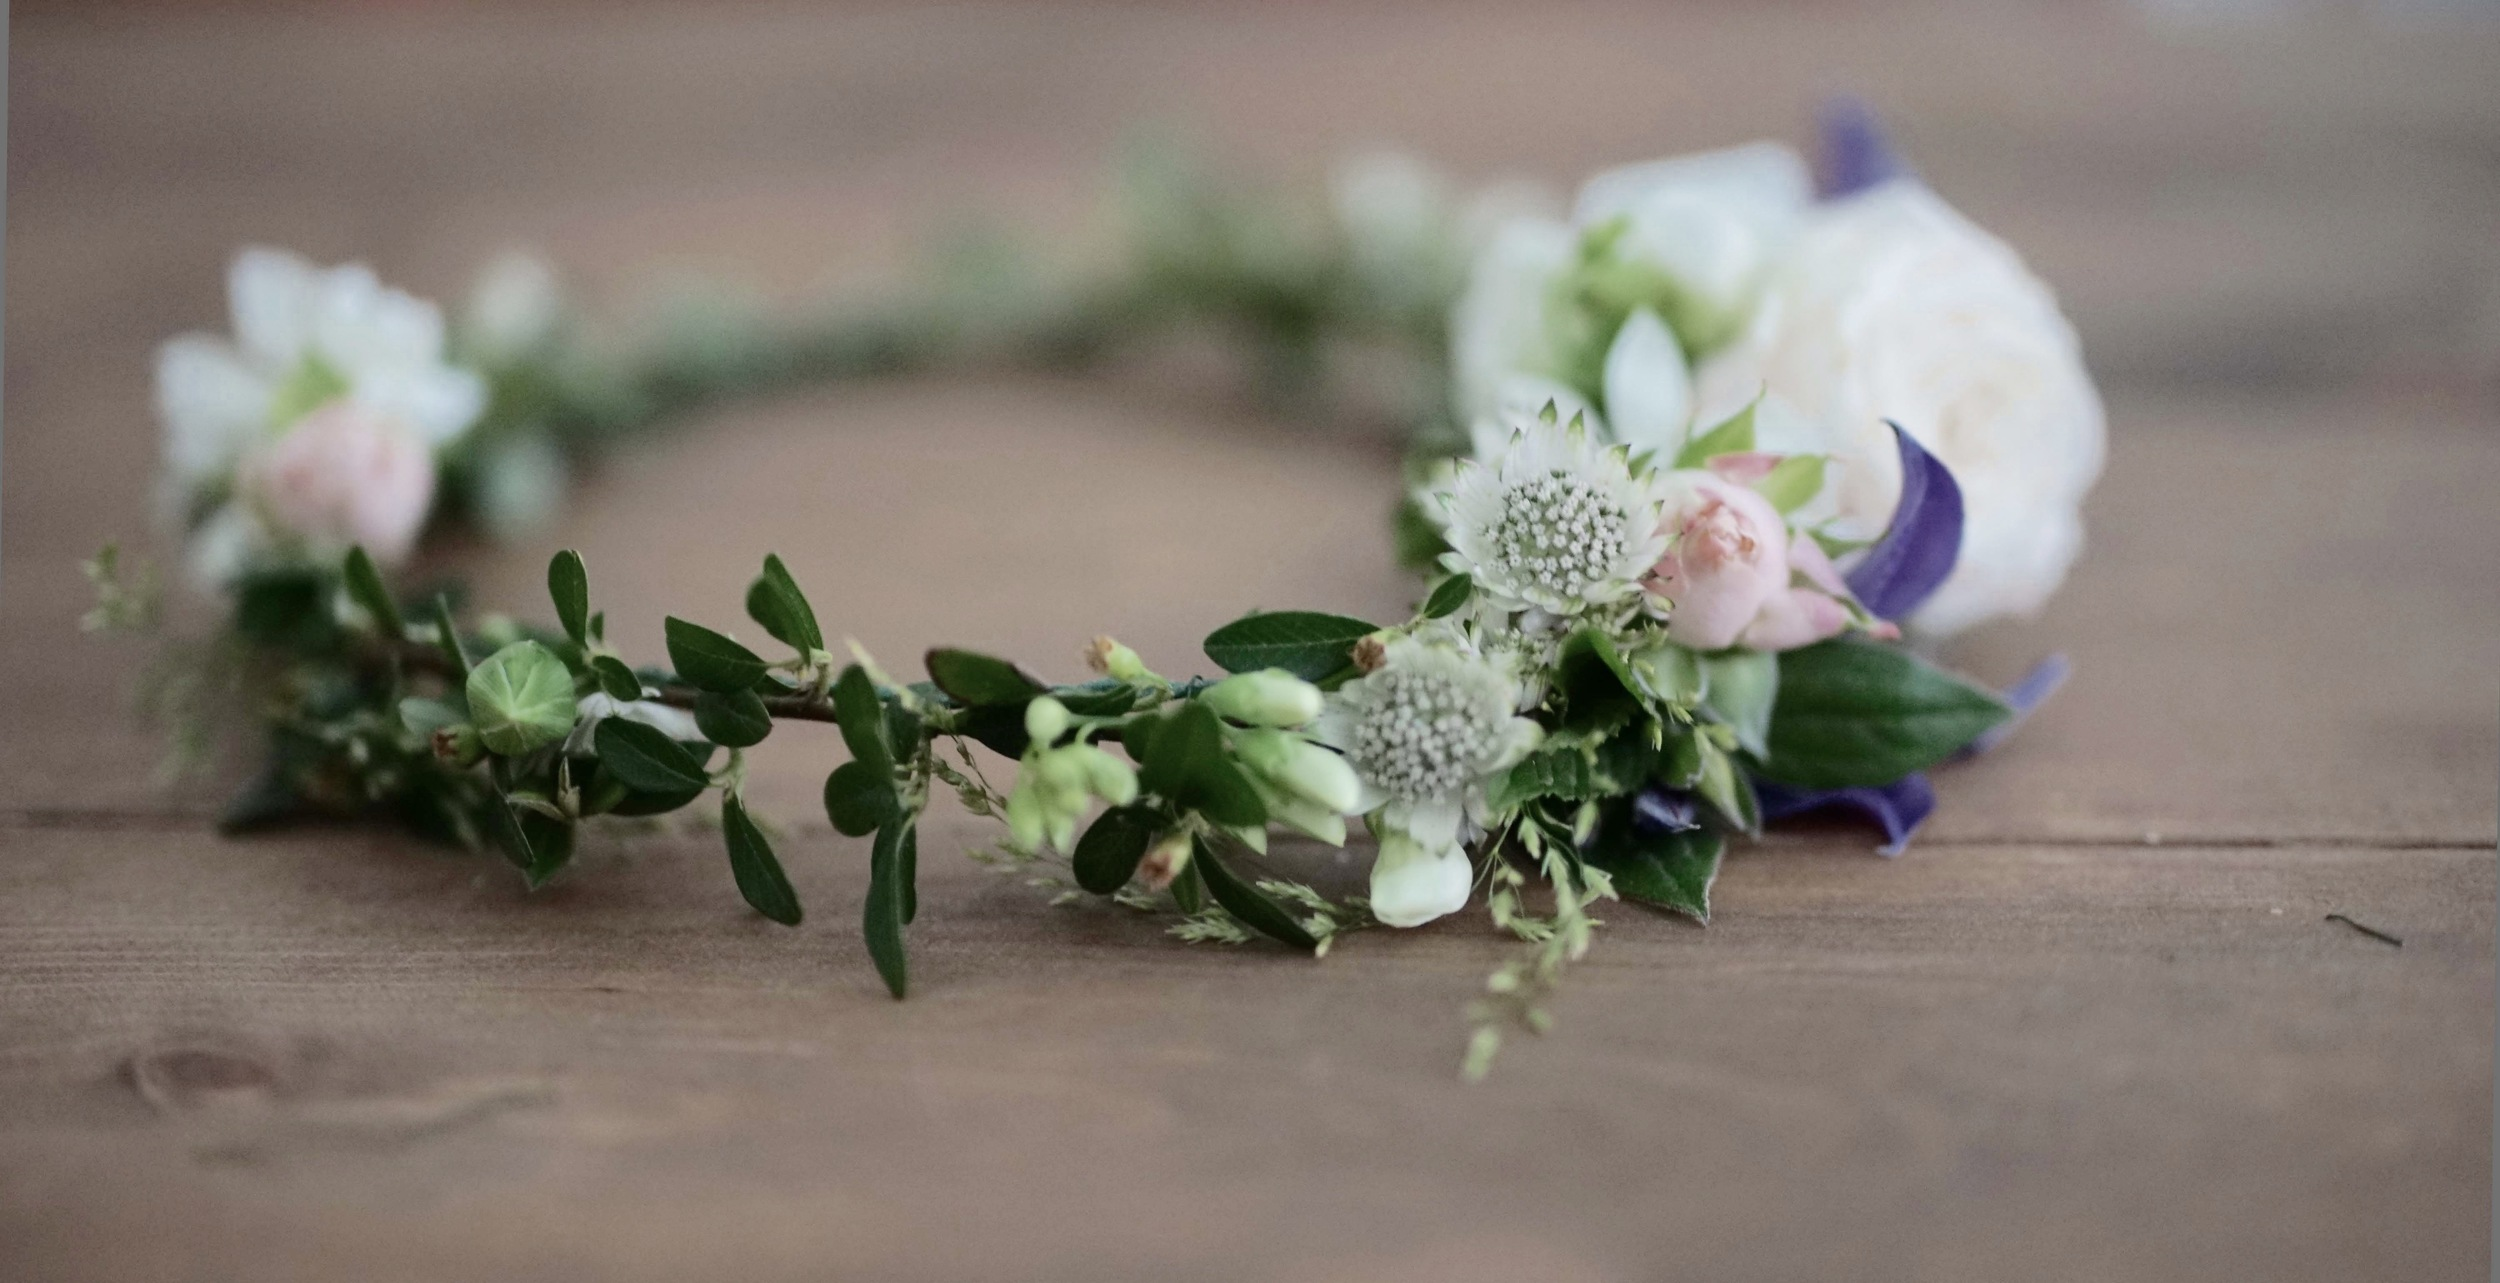 Josefin+Floral+Design.jpg